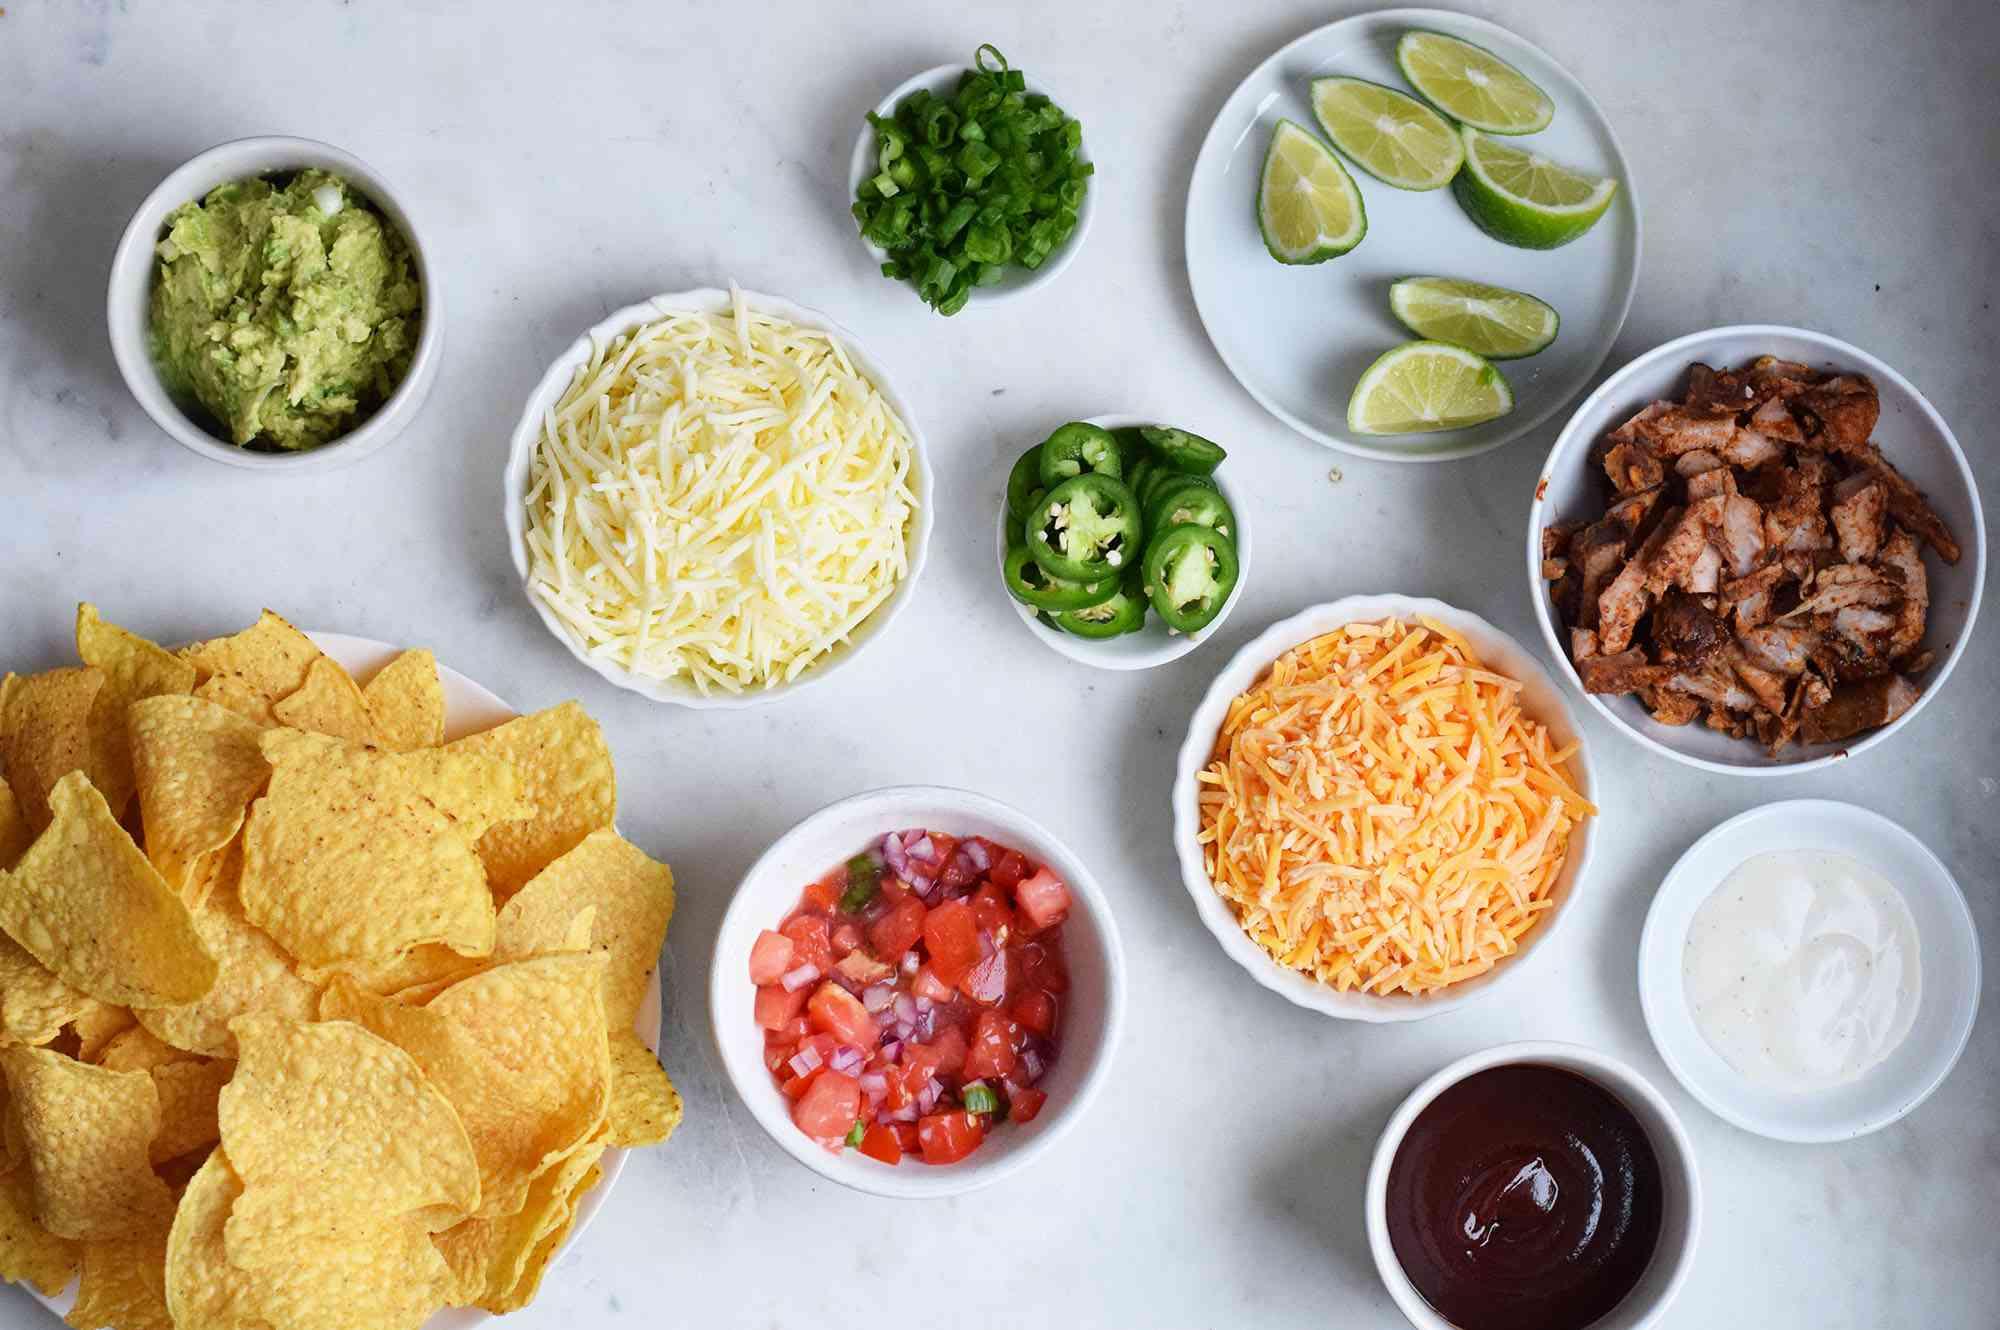 ingredients for pulled pork nachos